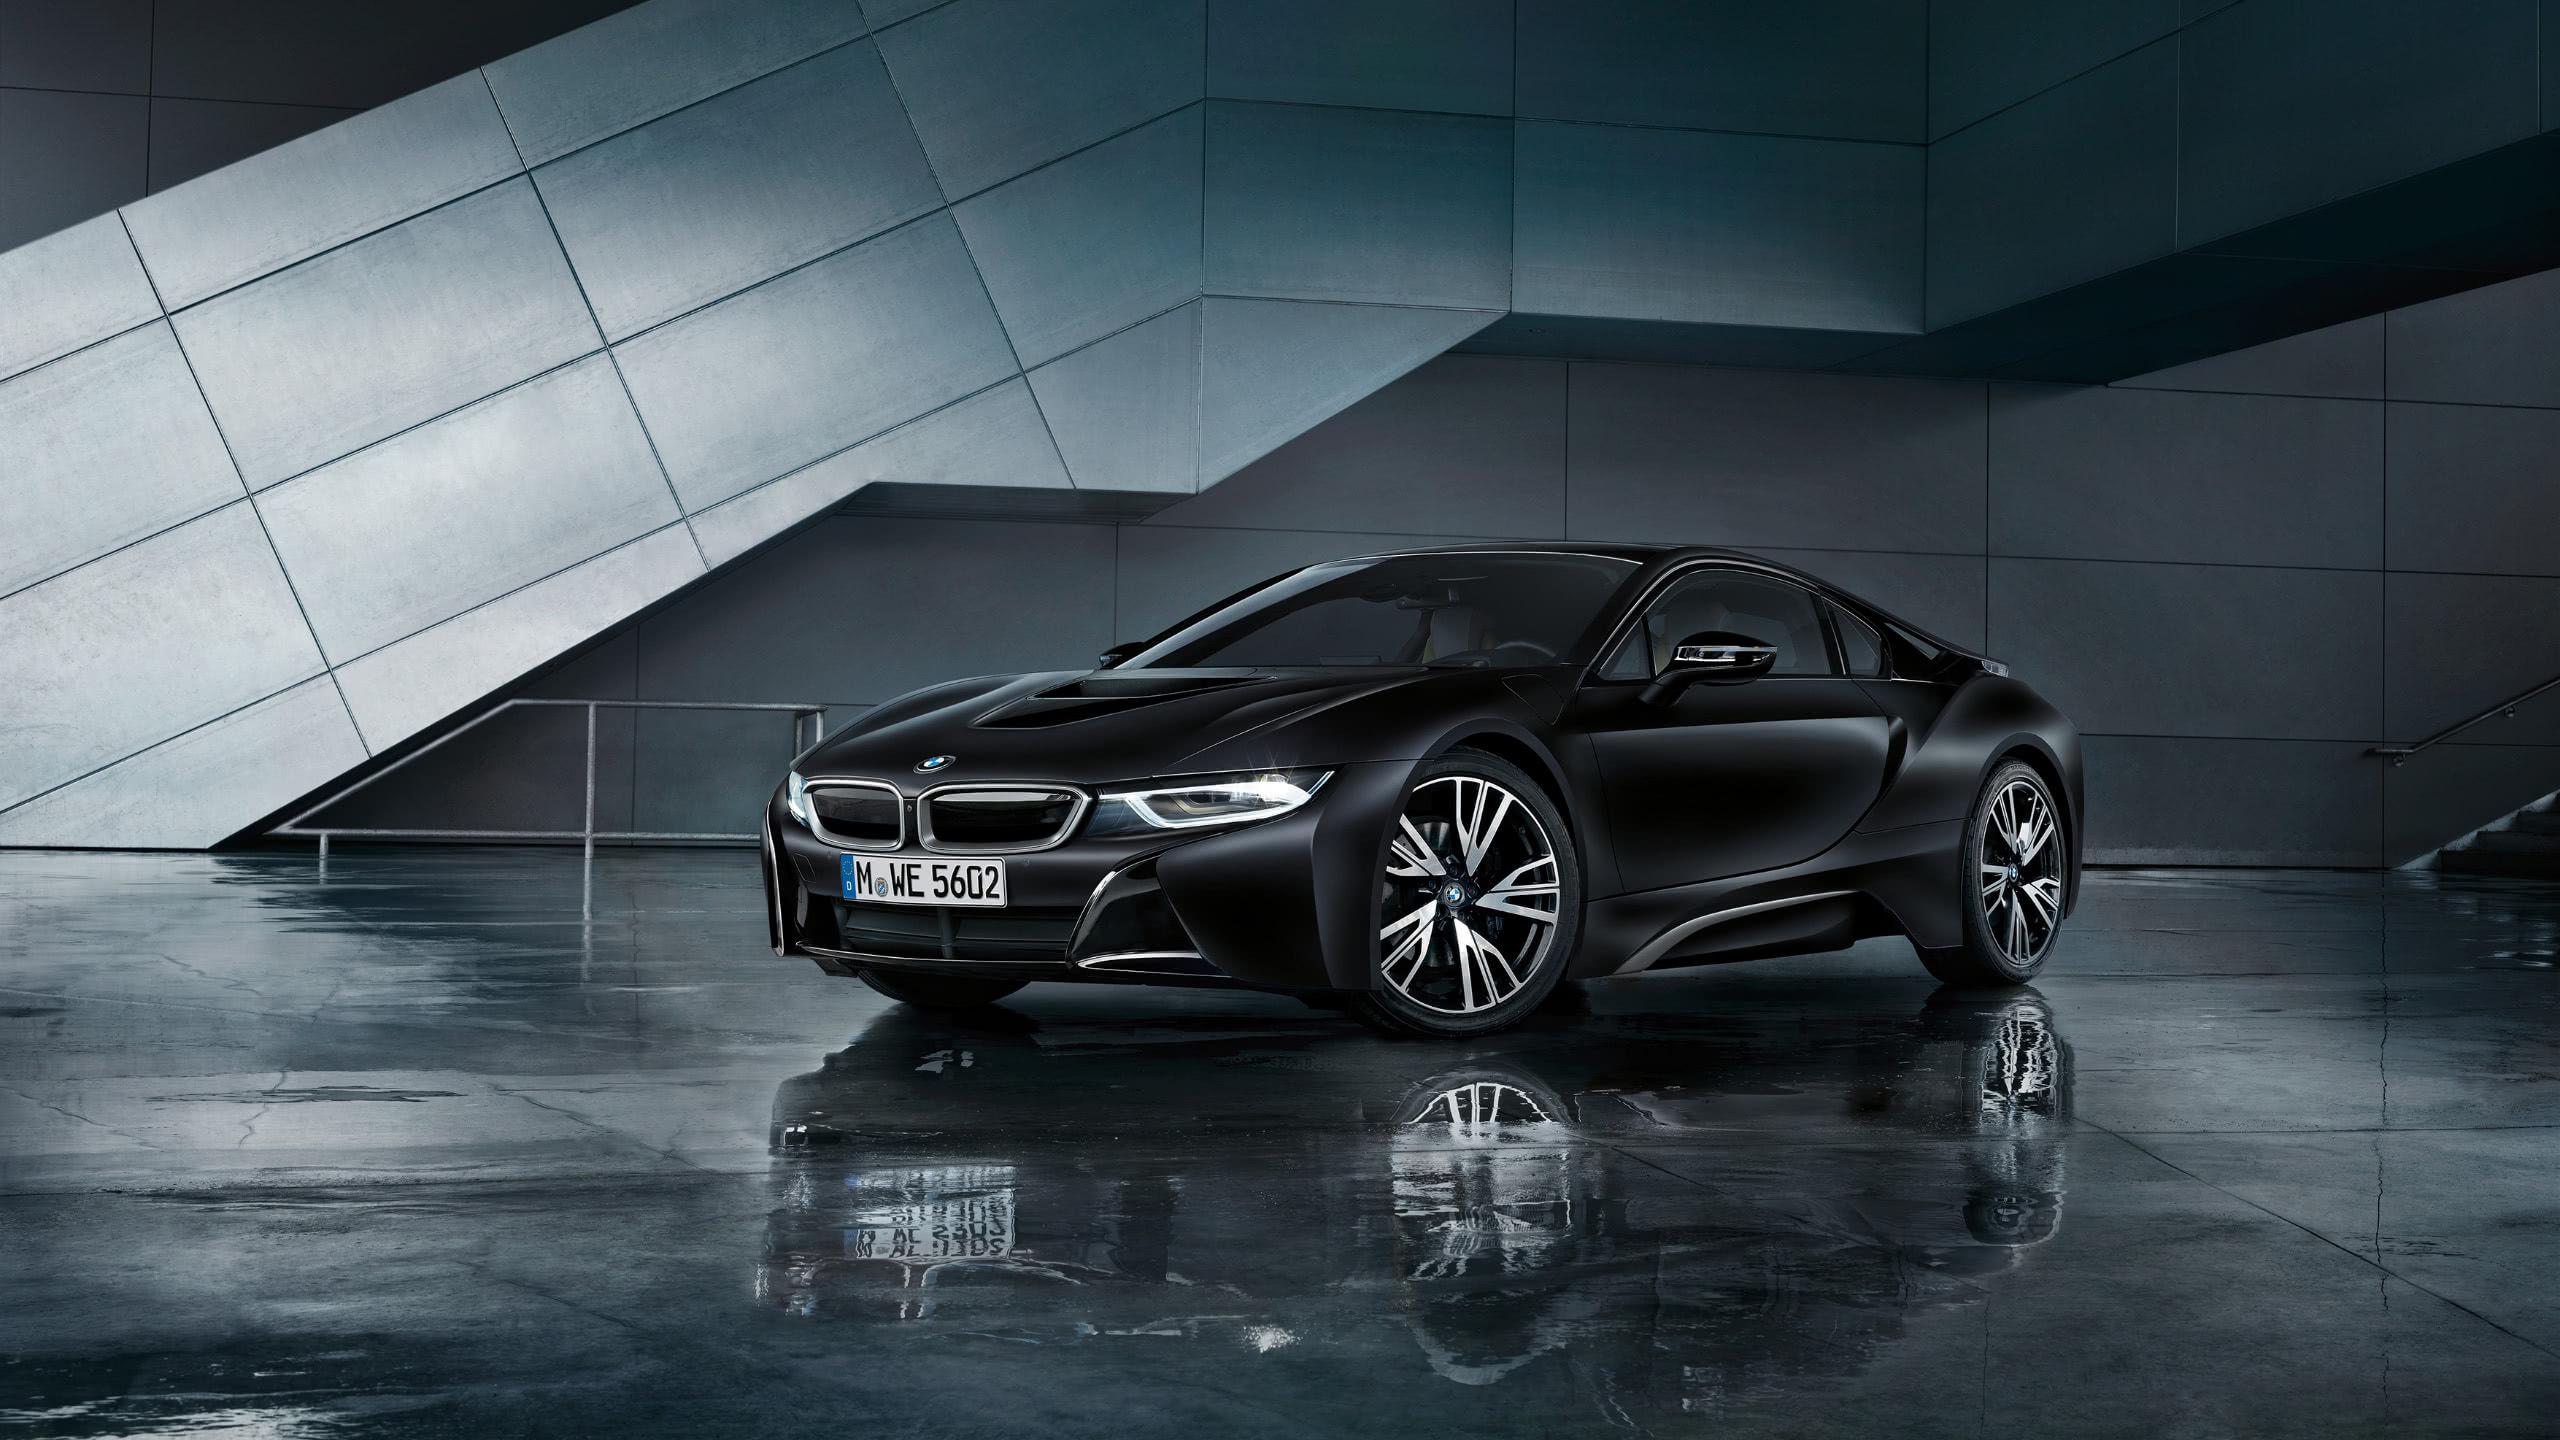 BMW I8 Black WQHD 1440P Wallpaper - Gilded Wallpapers